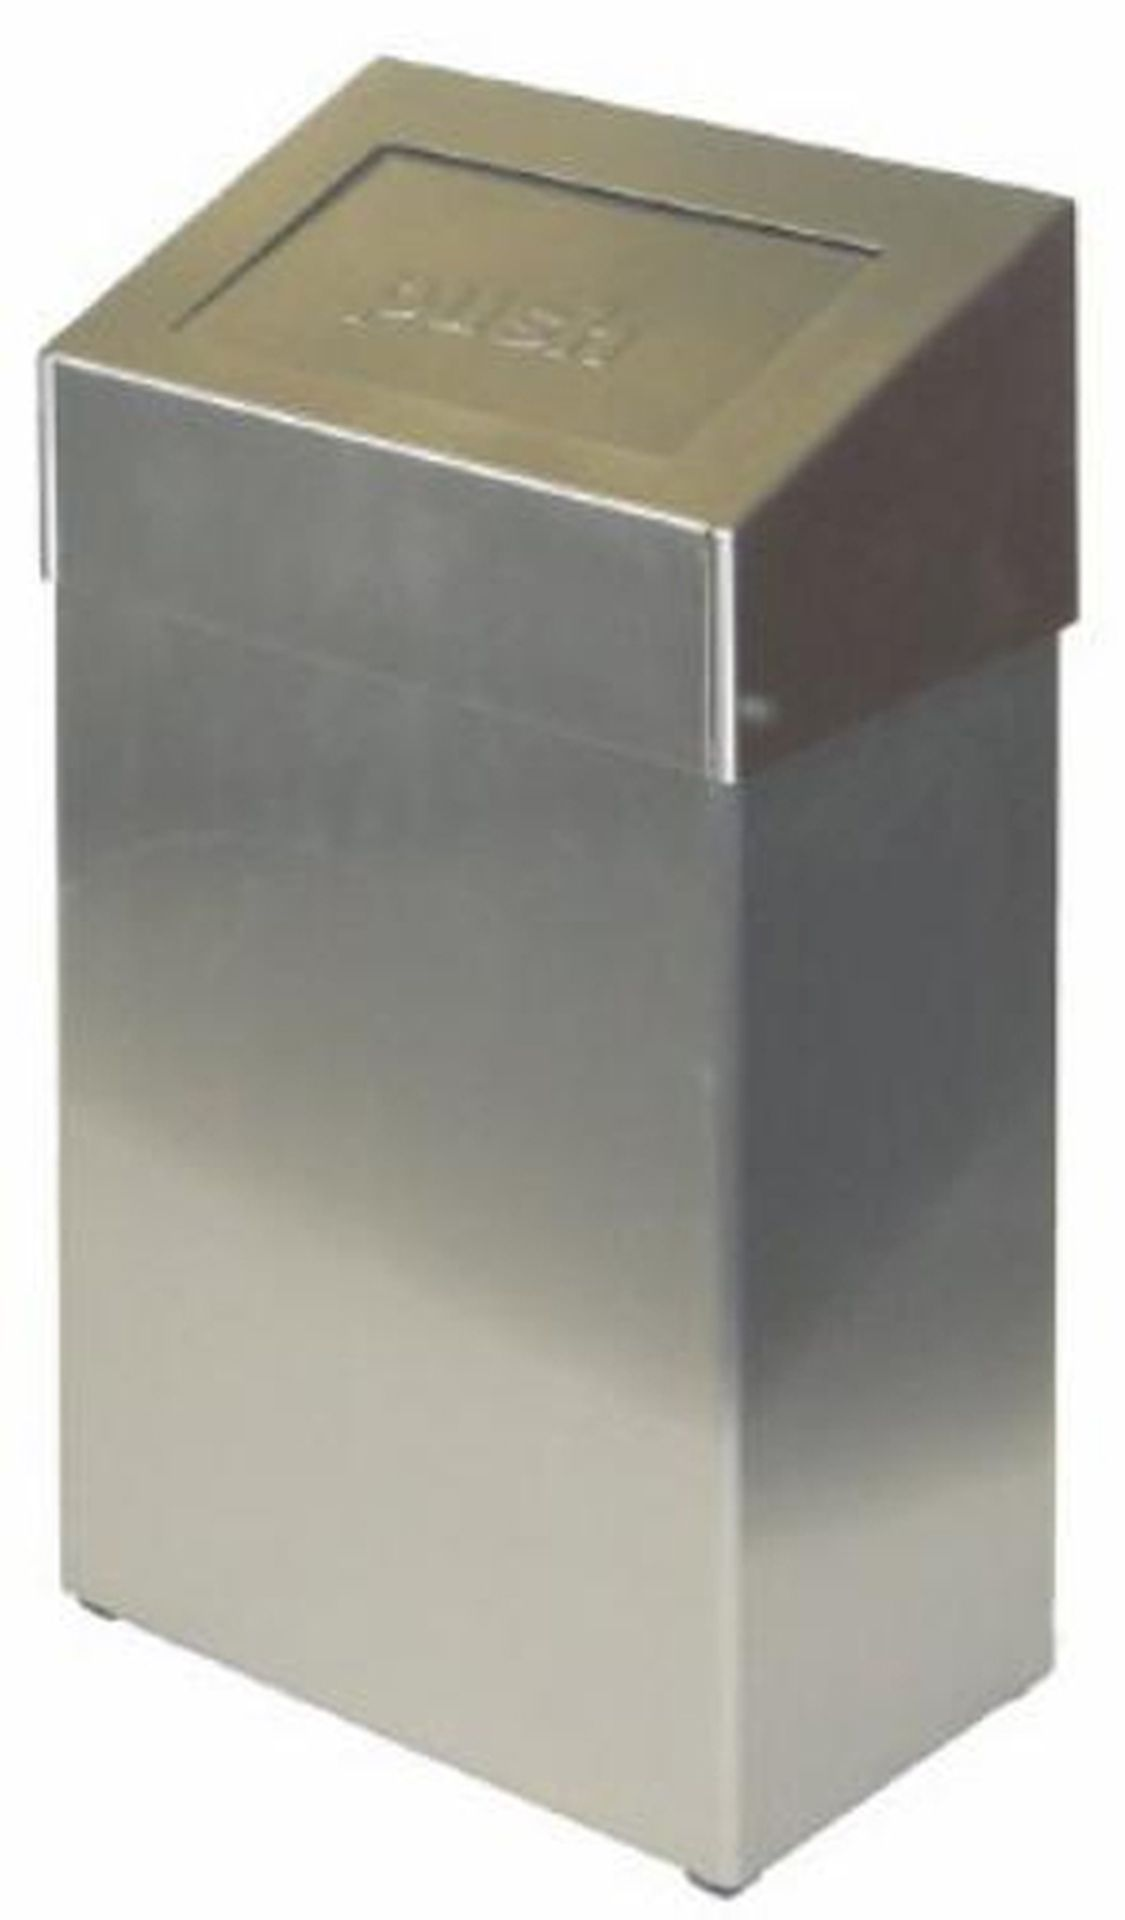 Tafel Prullenbak Rvs : St creatieve mini desktop prullenbak afvalbak tafel vuilnisbak